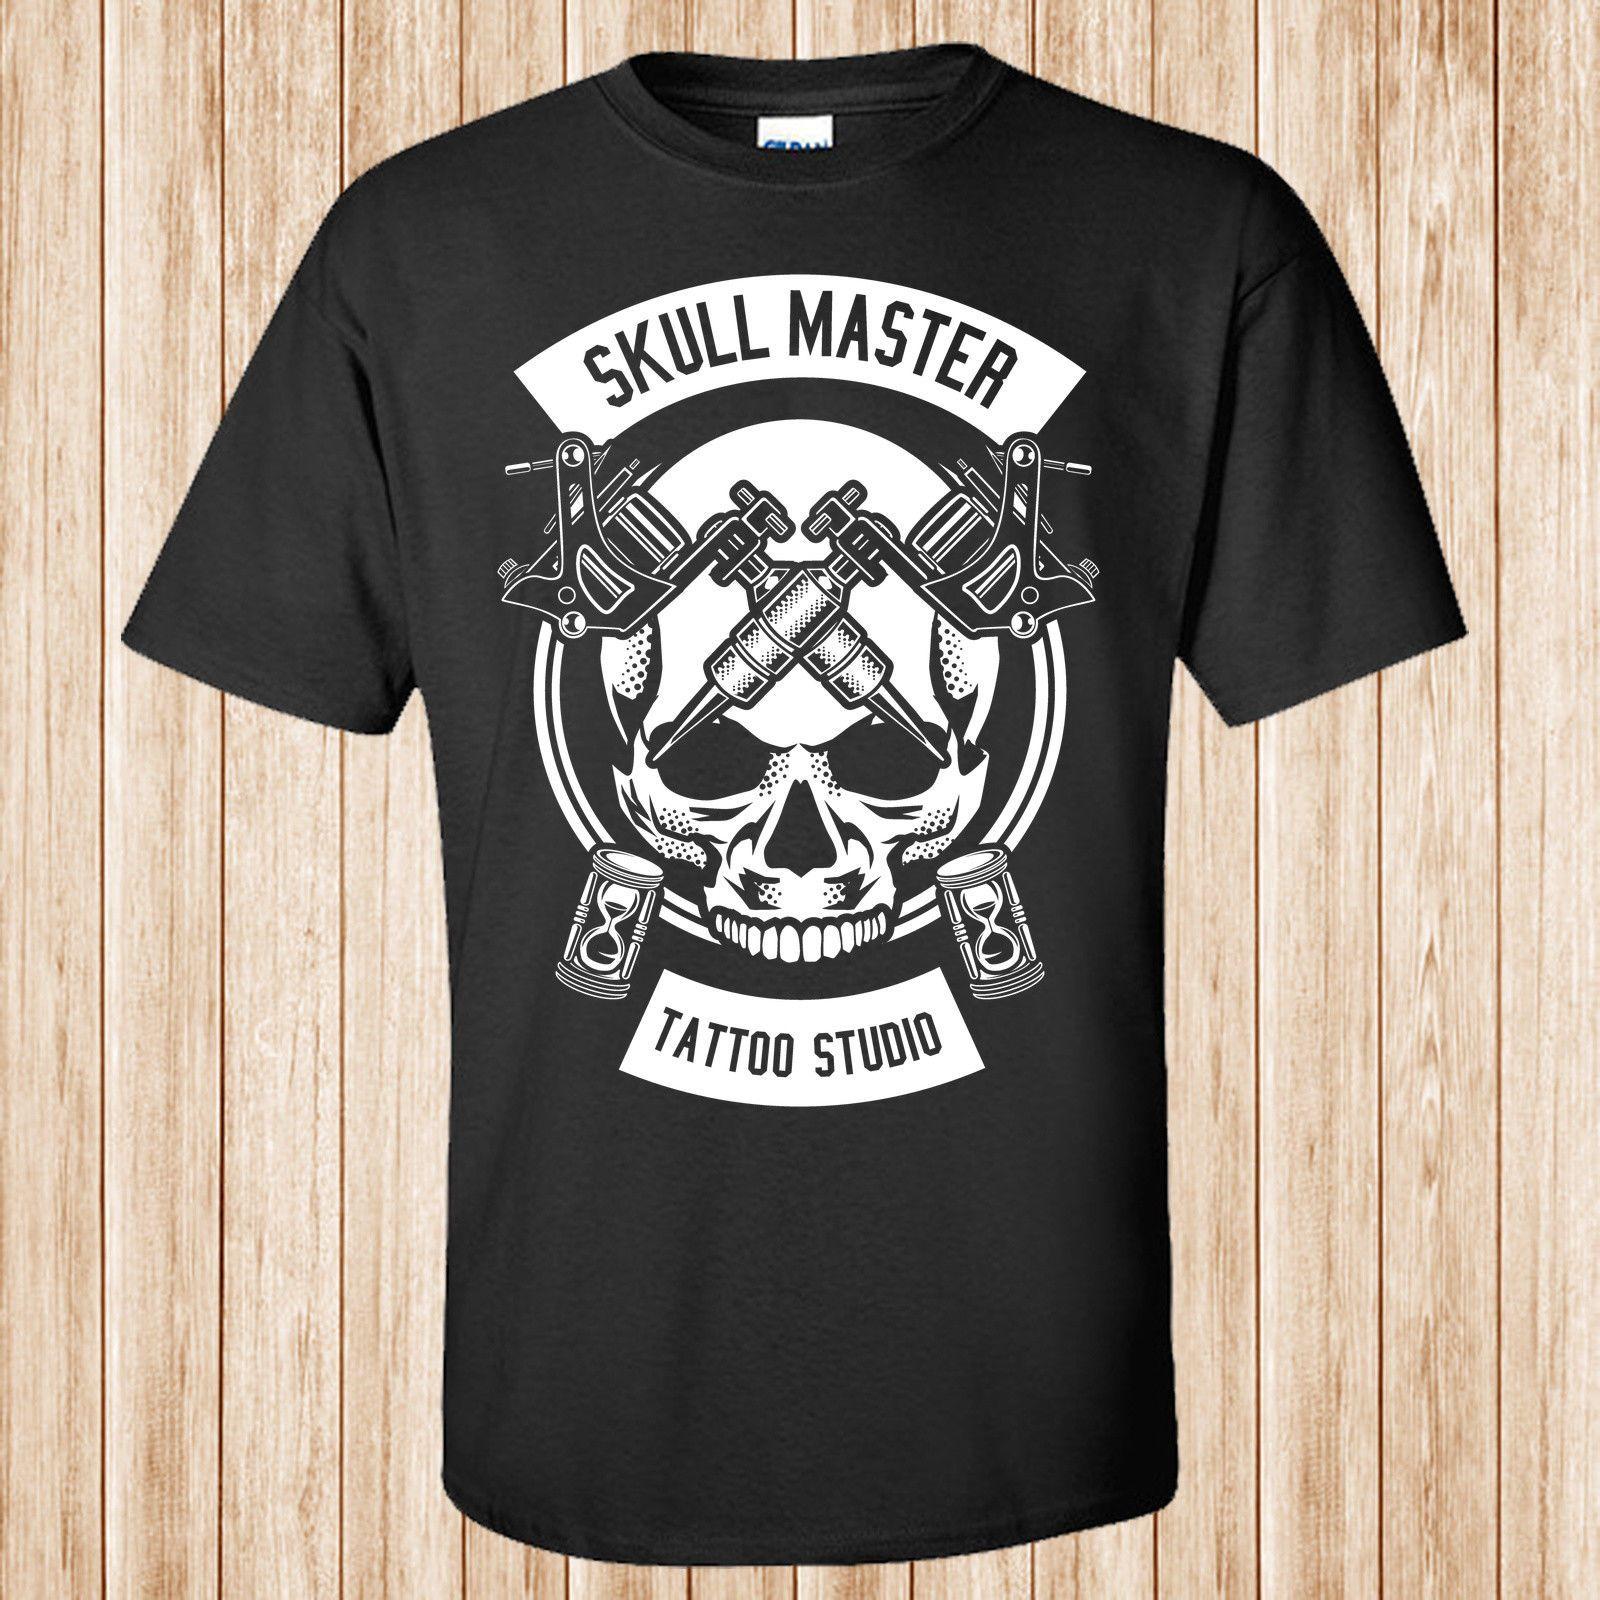 Skull Master Tattoo T Shirt Casual Male Tshirt Men Tops Tees Tees ...